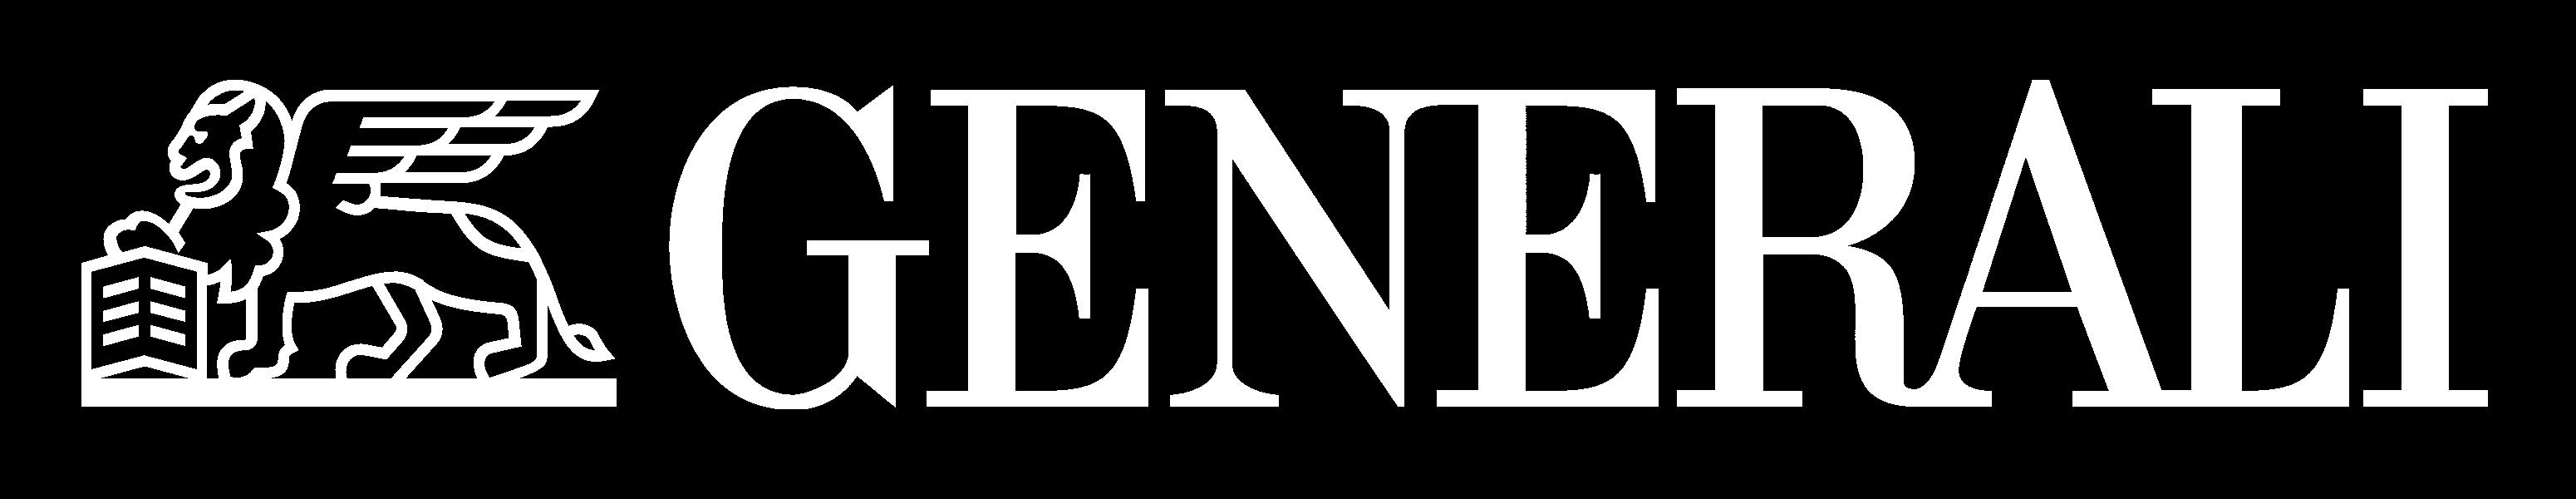 generali_logo_w